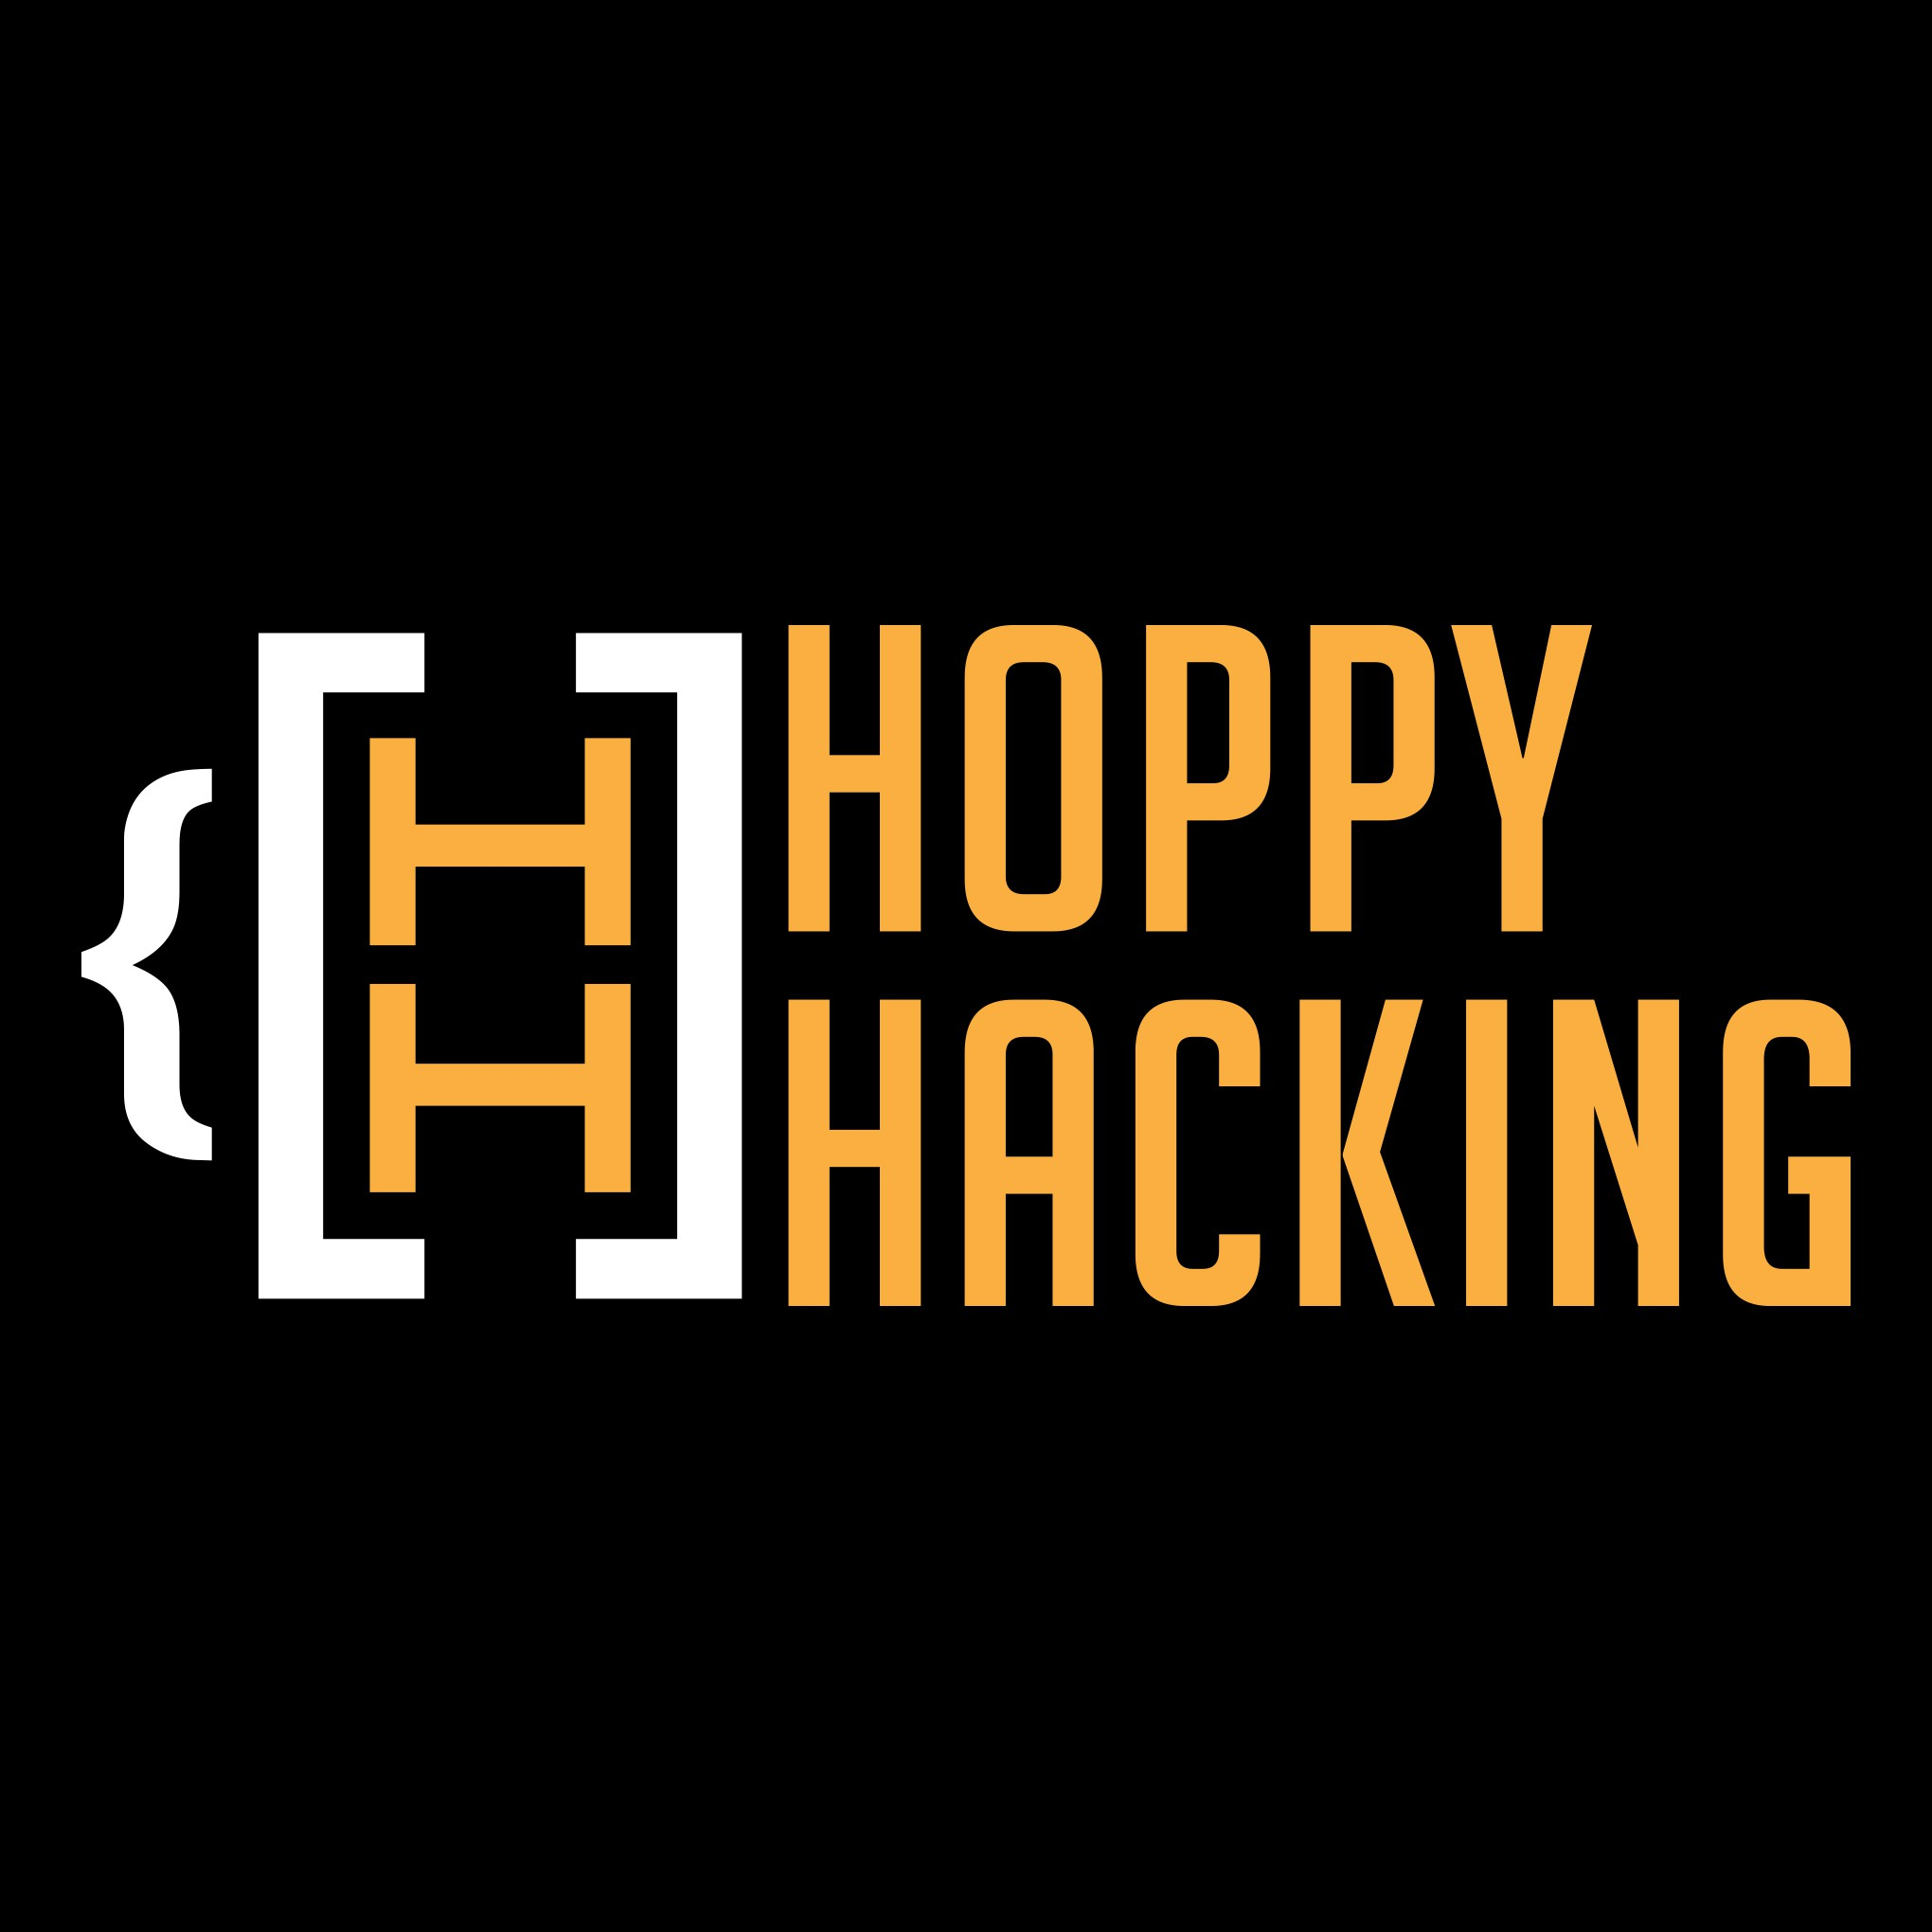 Hackers who like beer need a logo